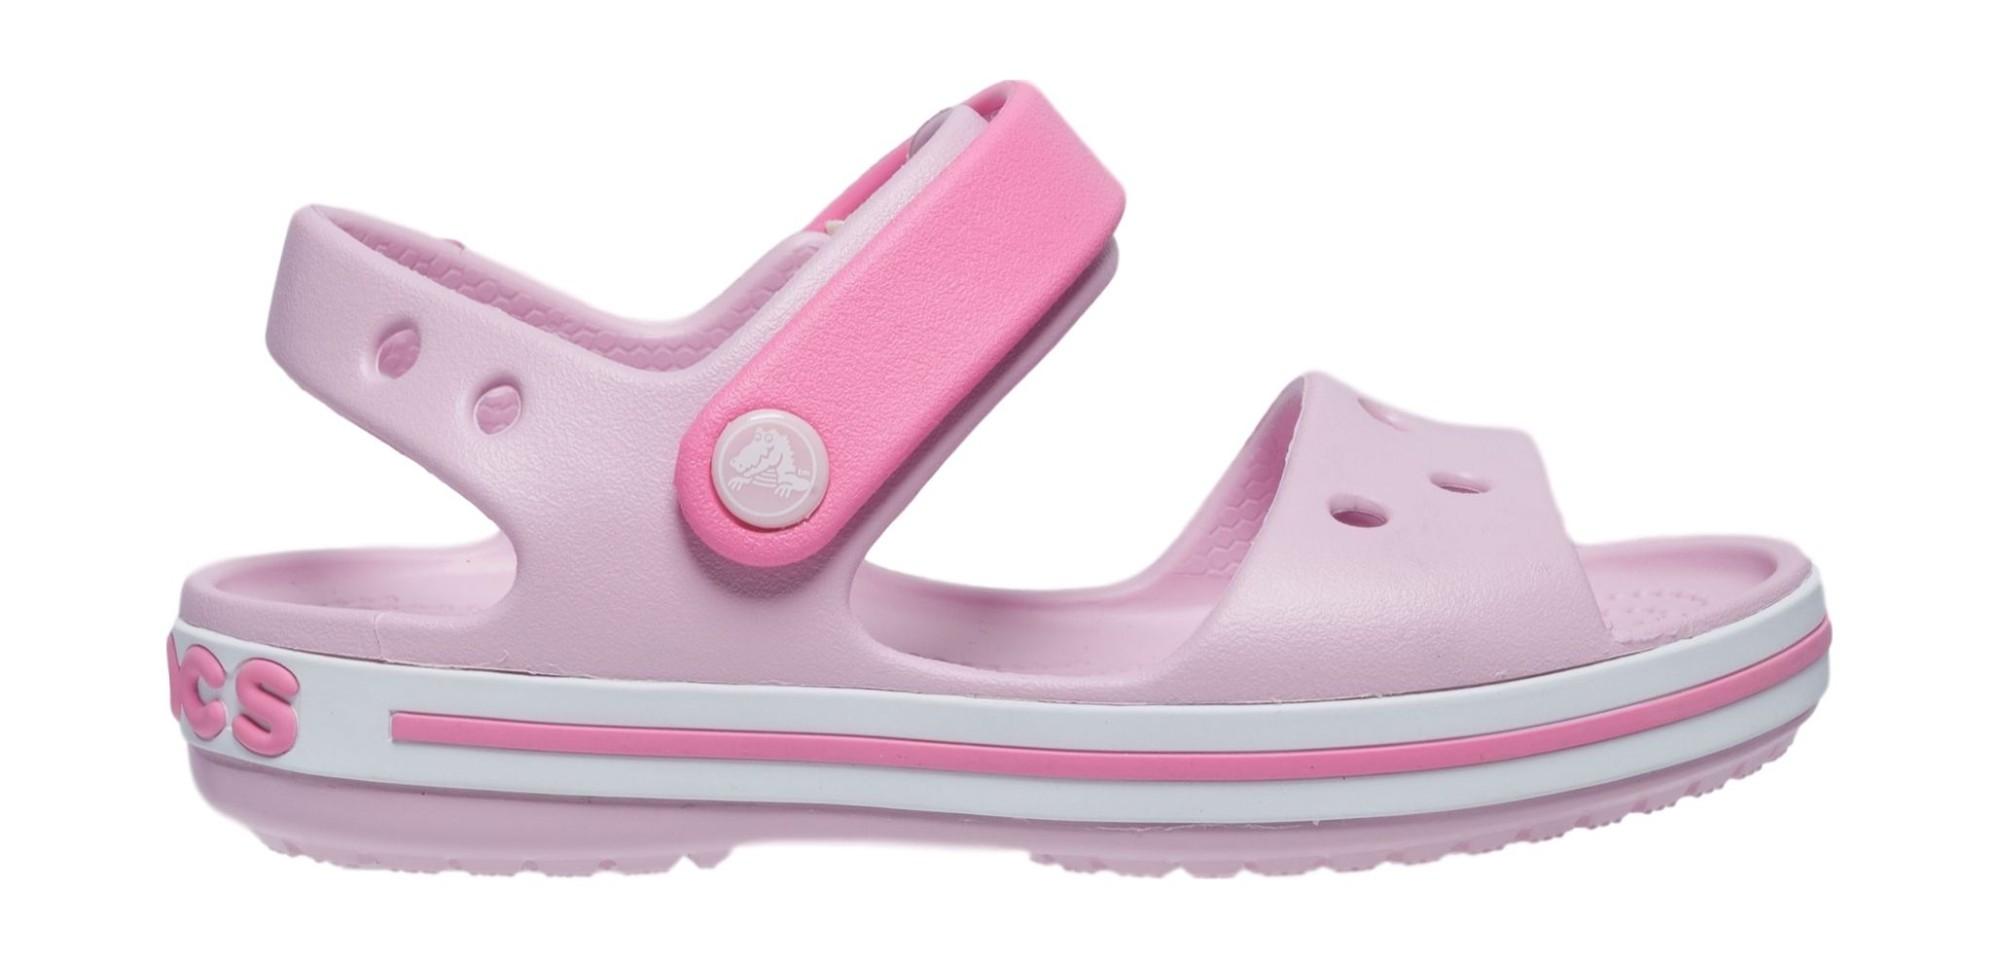 Crocs™ Crocband Sandal Kids Ballerina Pink 26